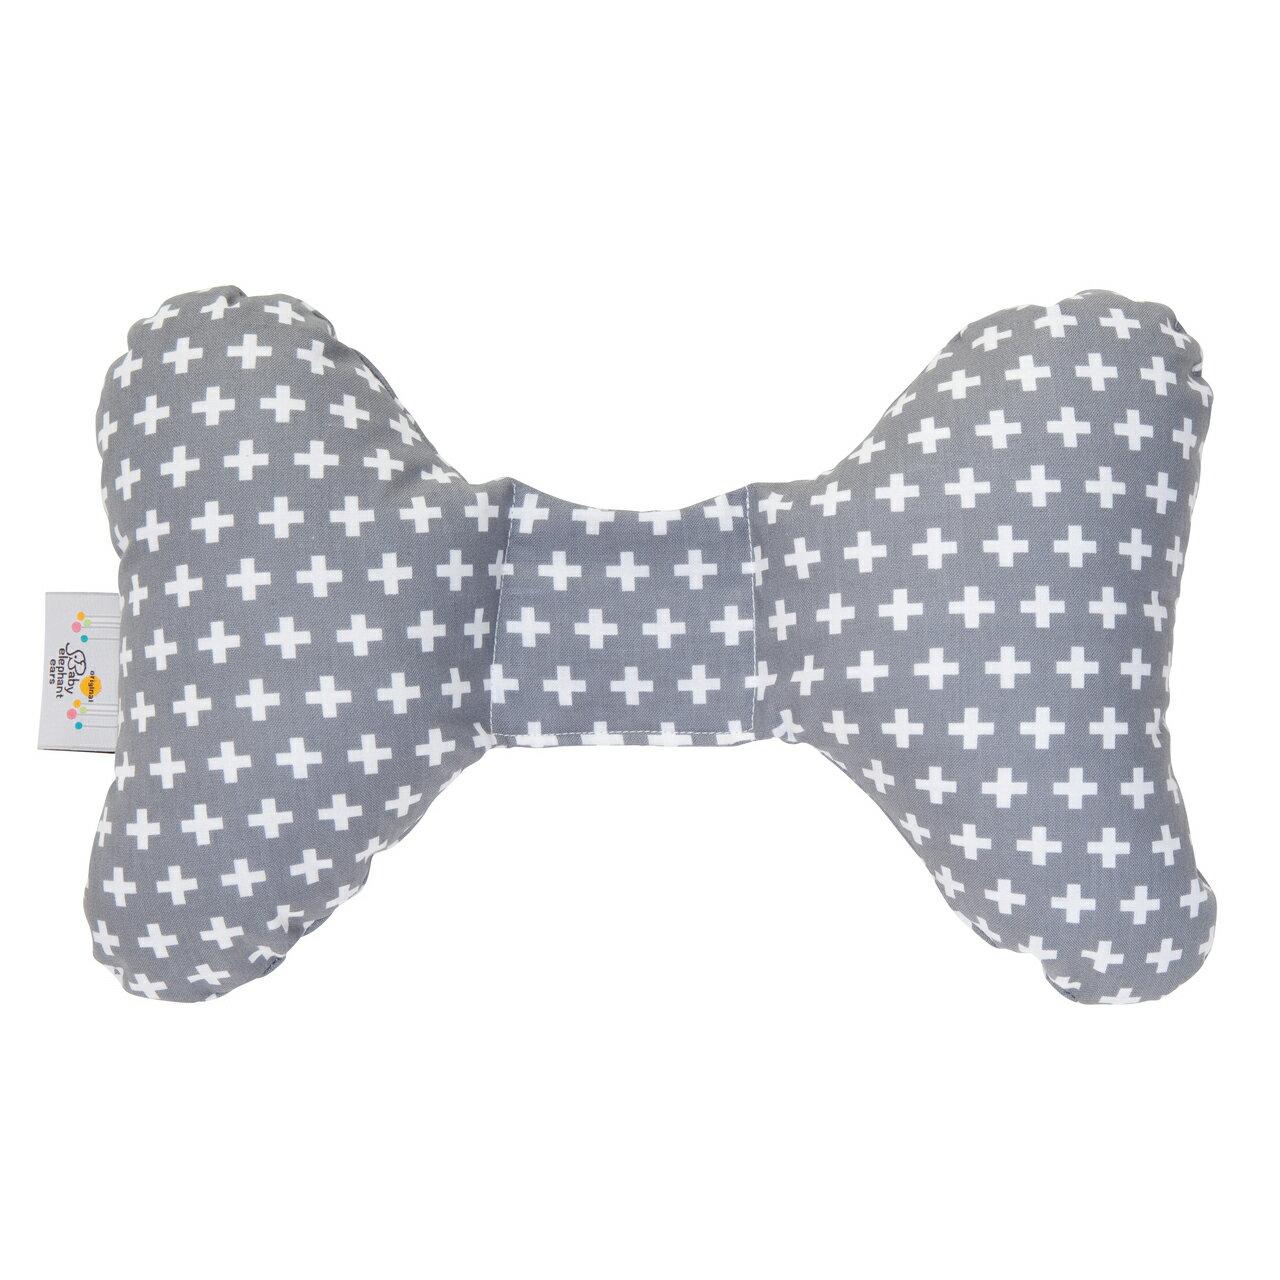 Baby Elephant Ears 寶寶護頸枕 - 白色十字花紋 GREY CROSS EAR / 34.5cmx20cmx5cm